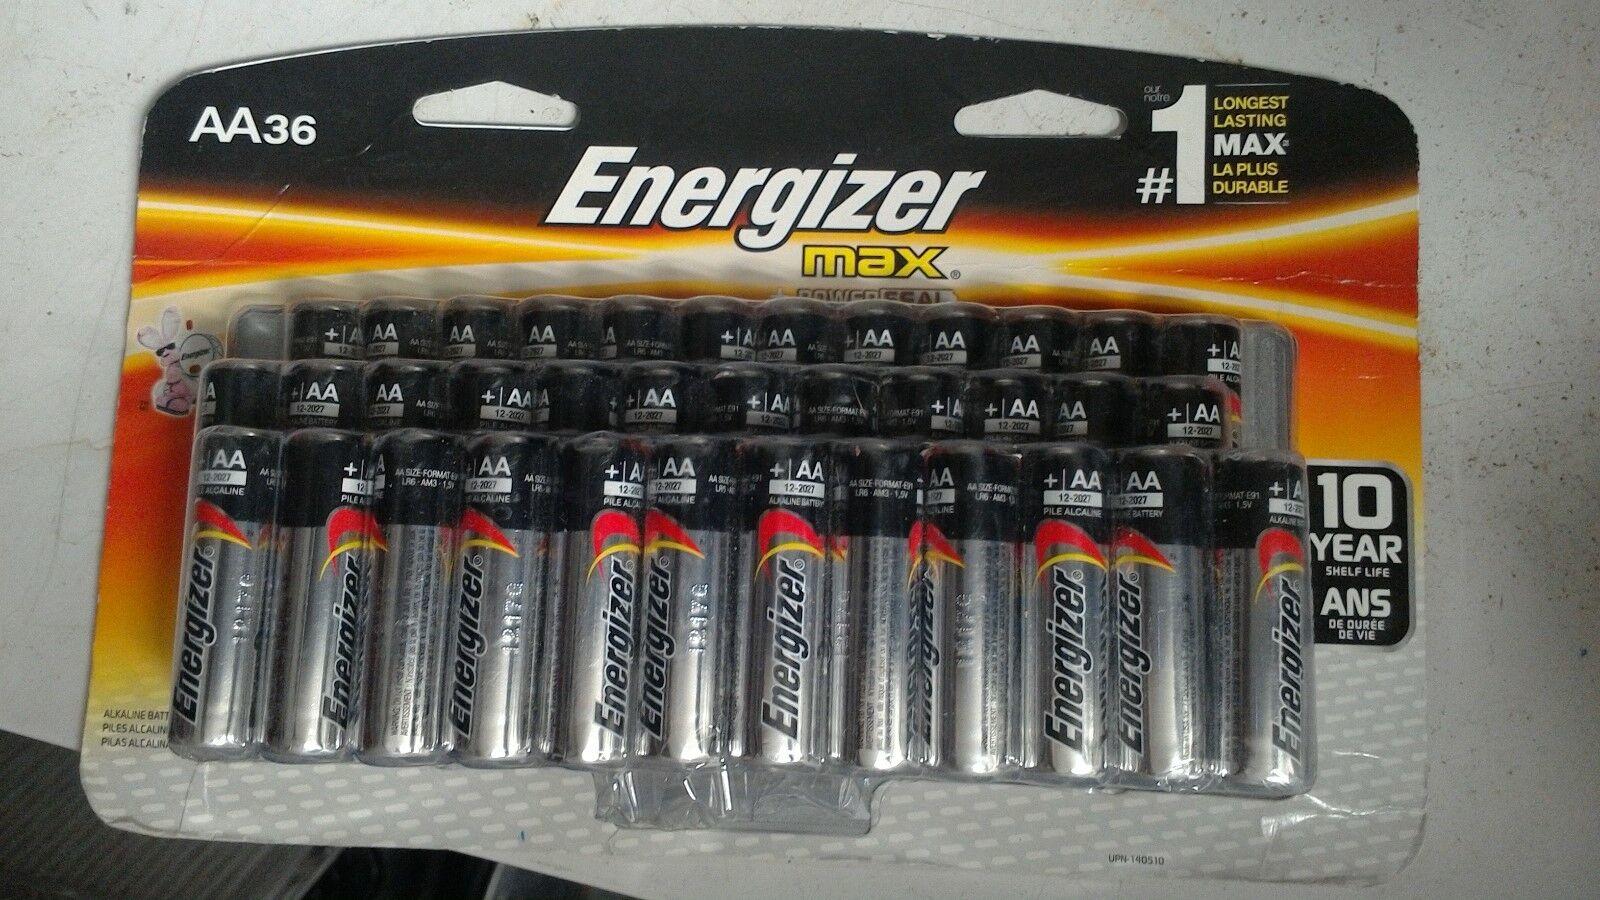 NEW AA Energizer MAX + Powerseal 36 Pack Alkaline Batteries